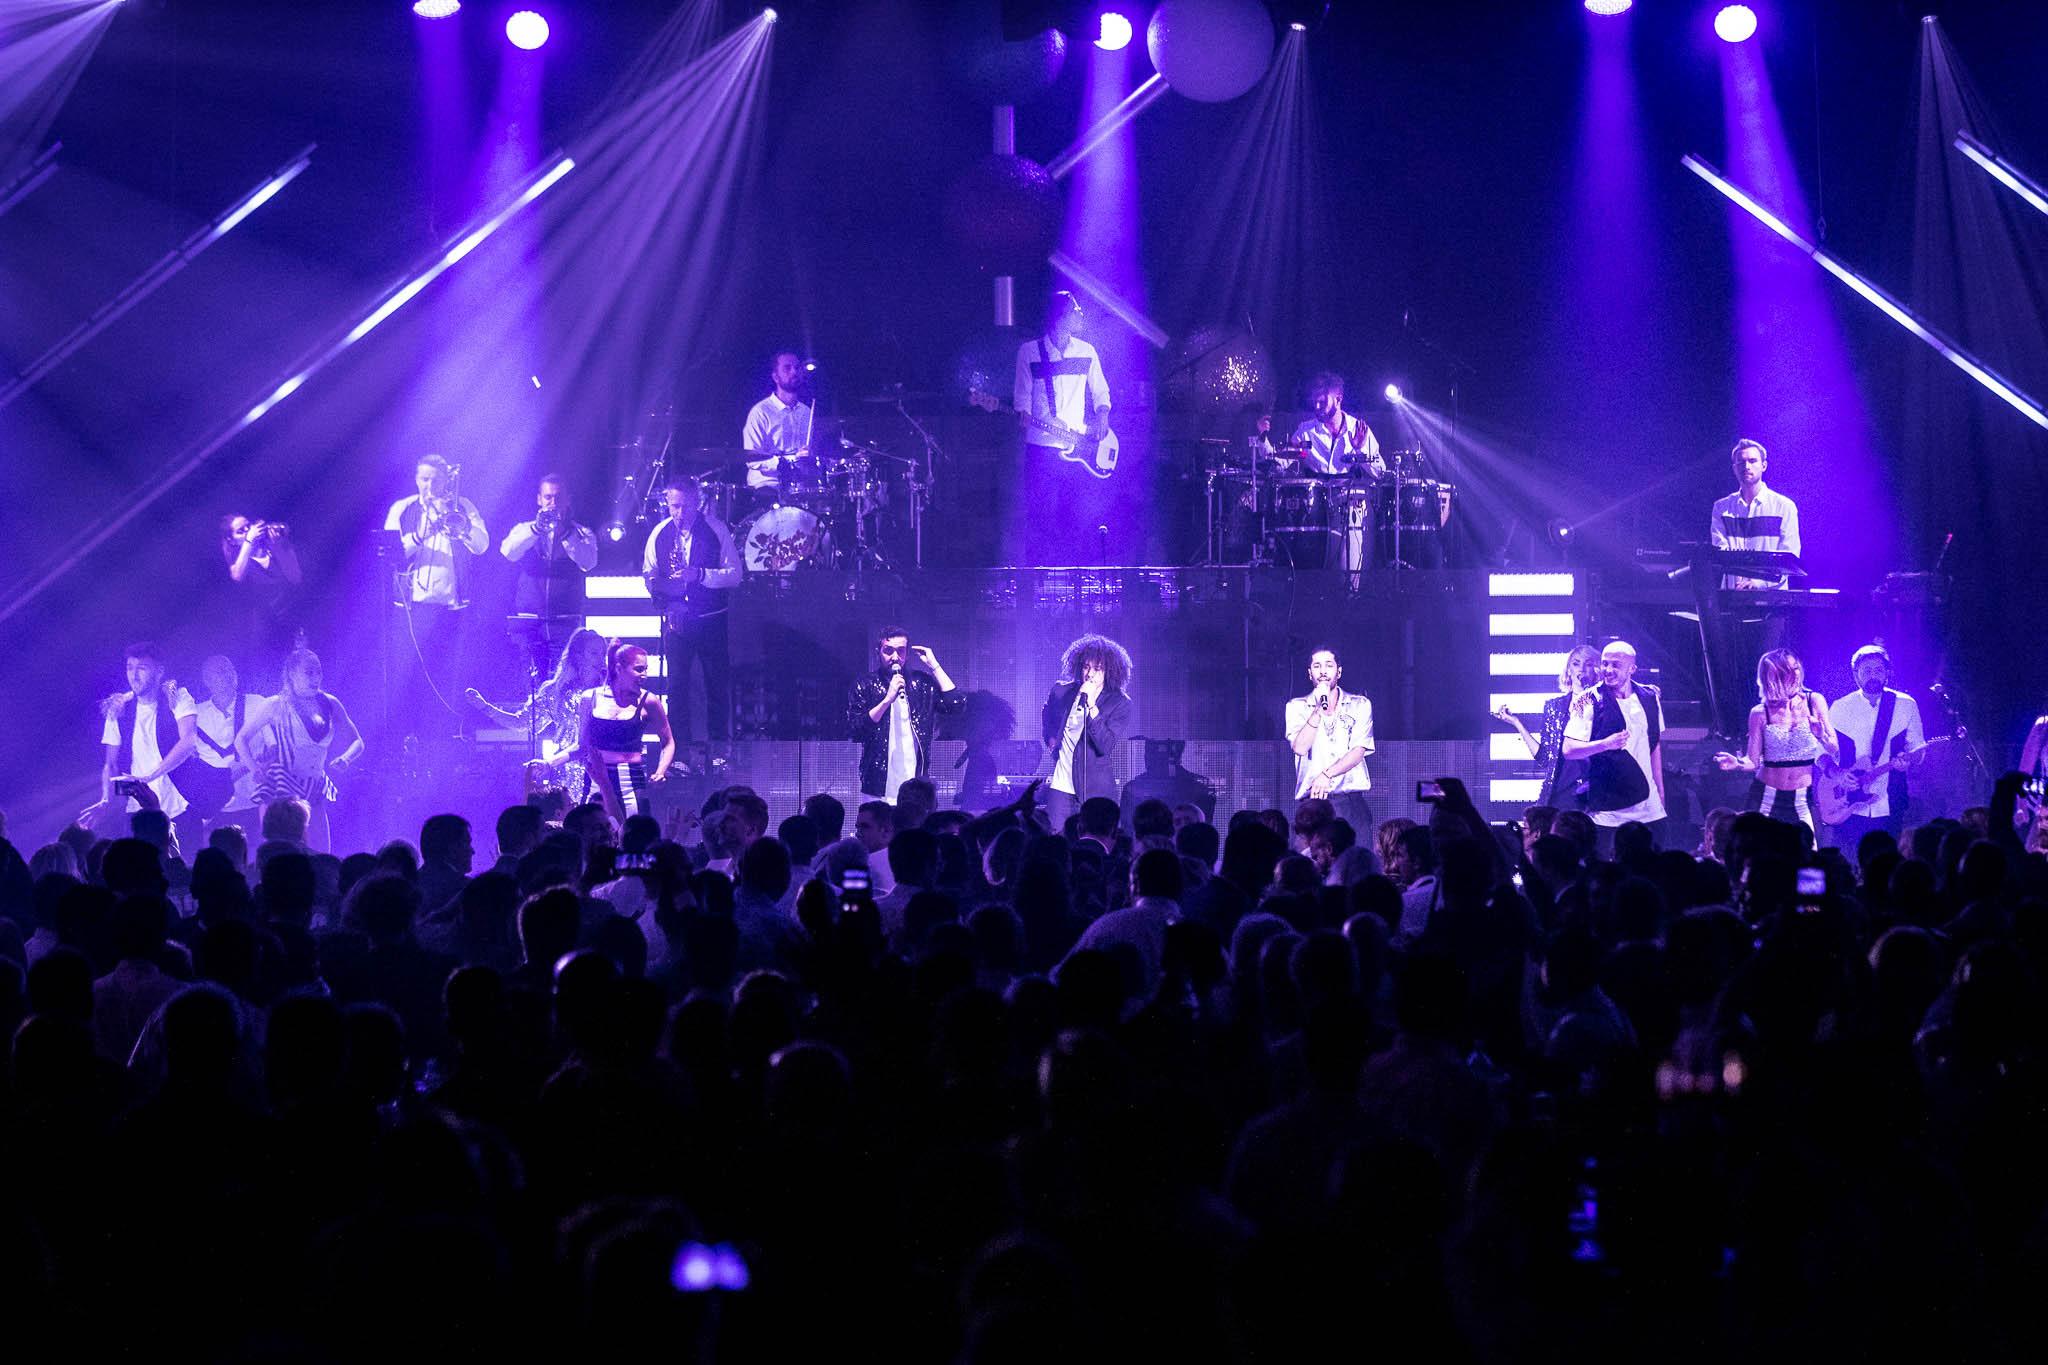 Fresh_Music_Live_Coverband_Media_18